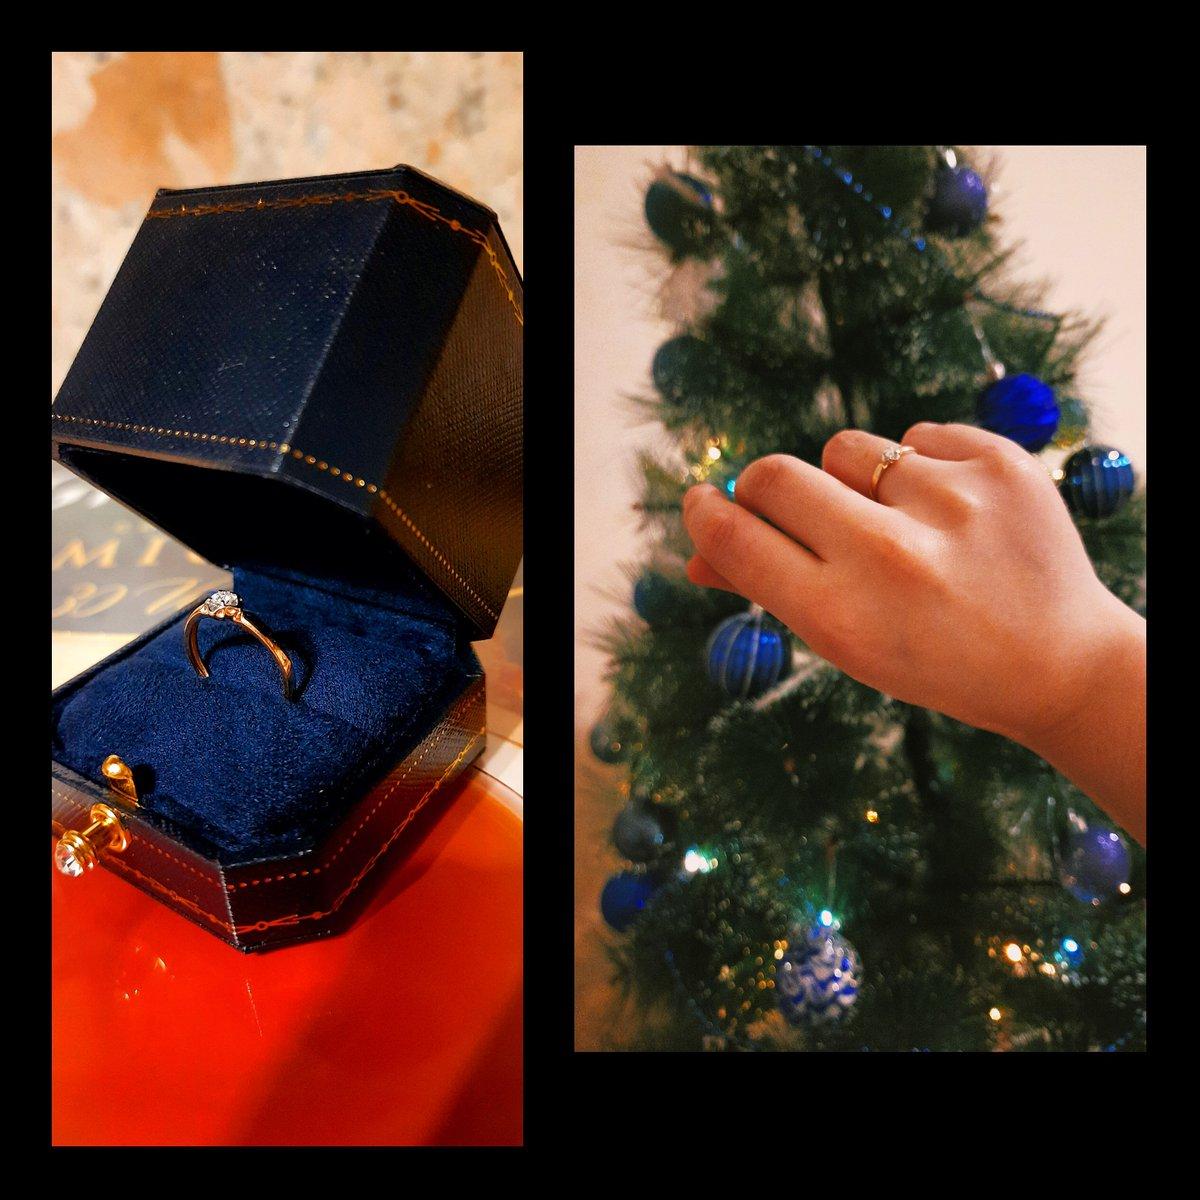 Кольцо от бриллиантов якутии